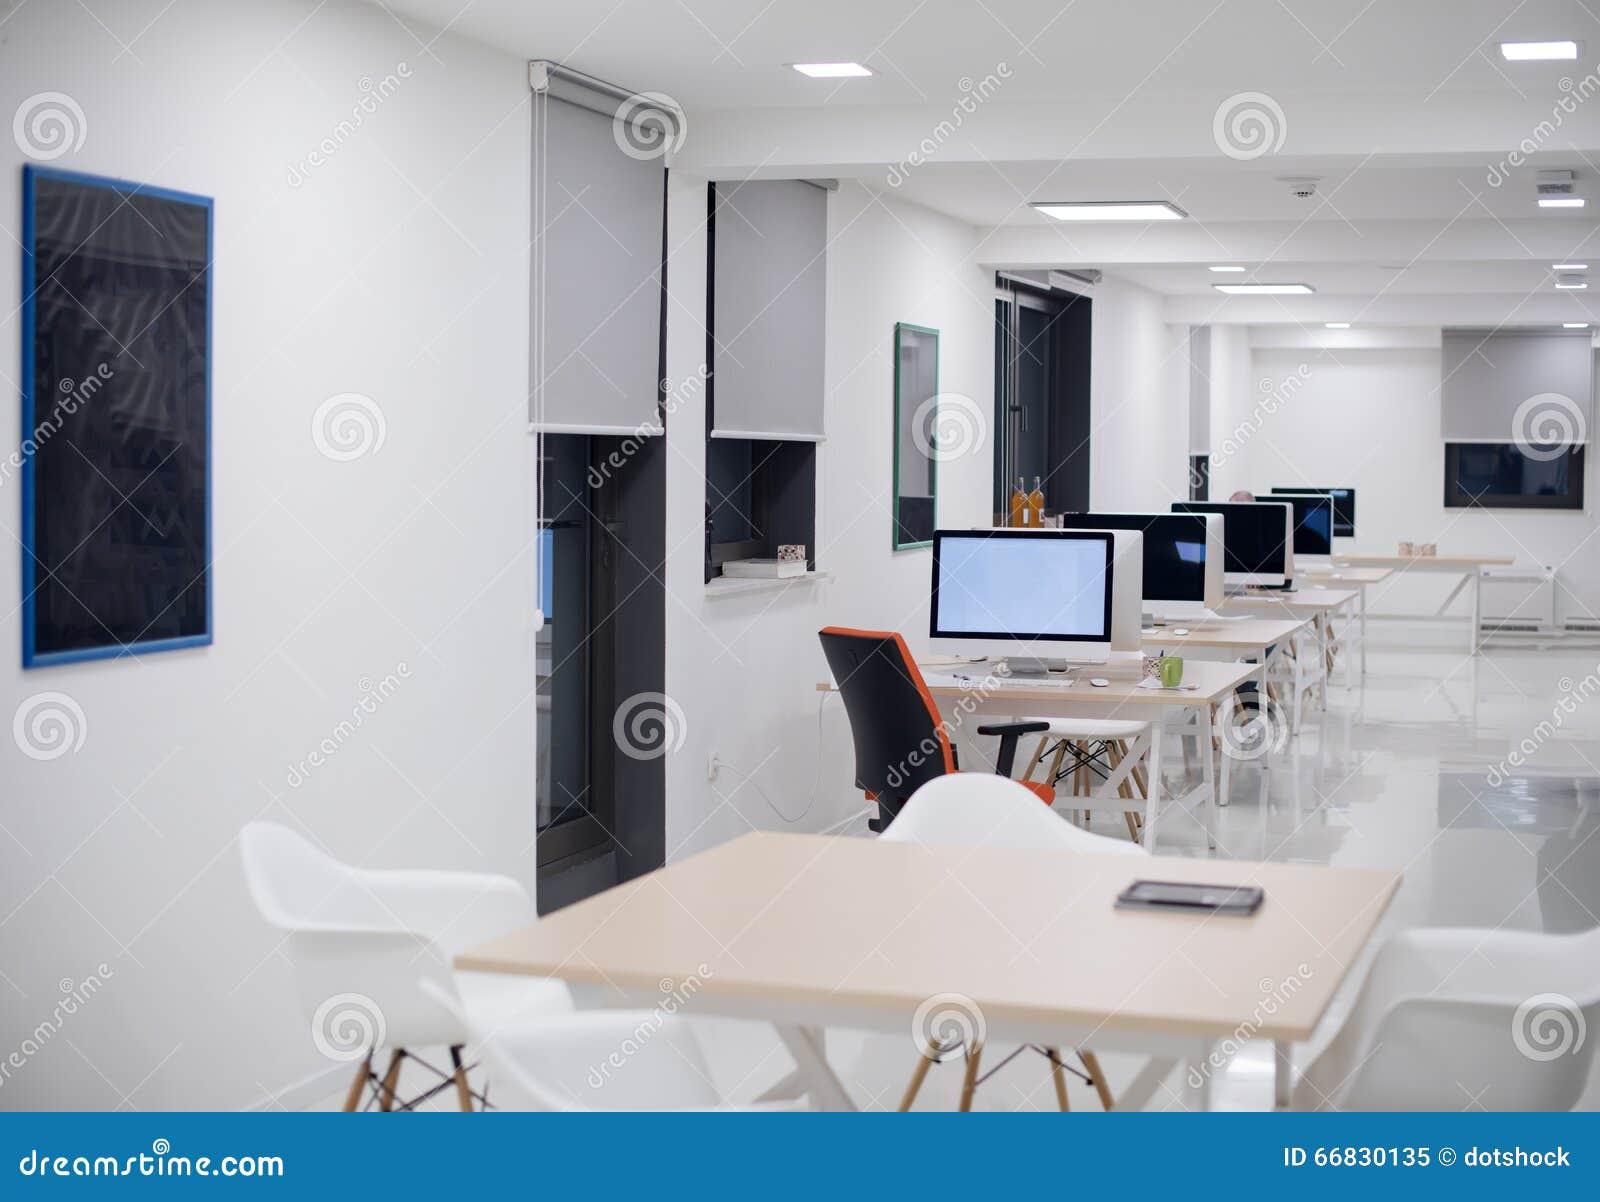 empty startup business office interior business office modern